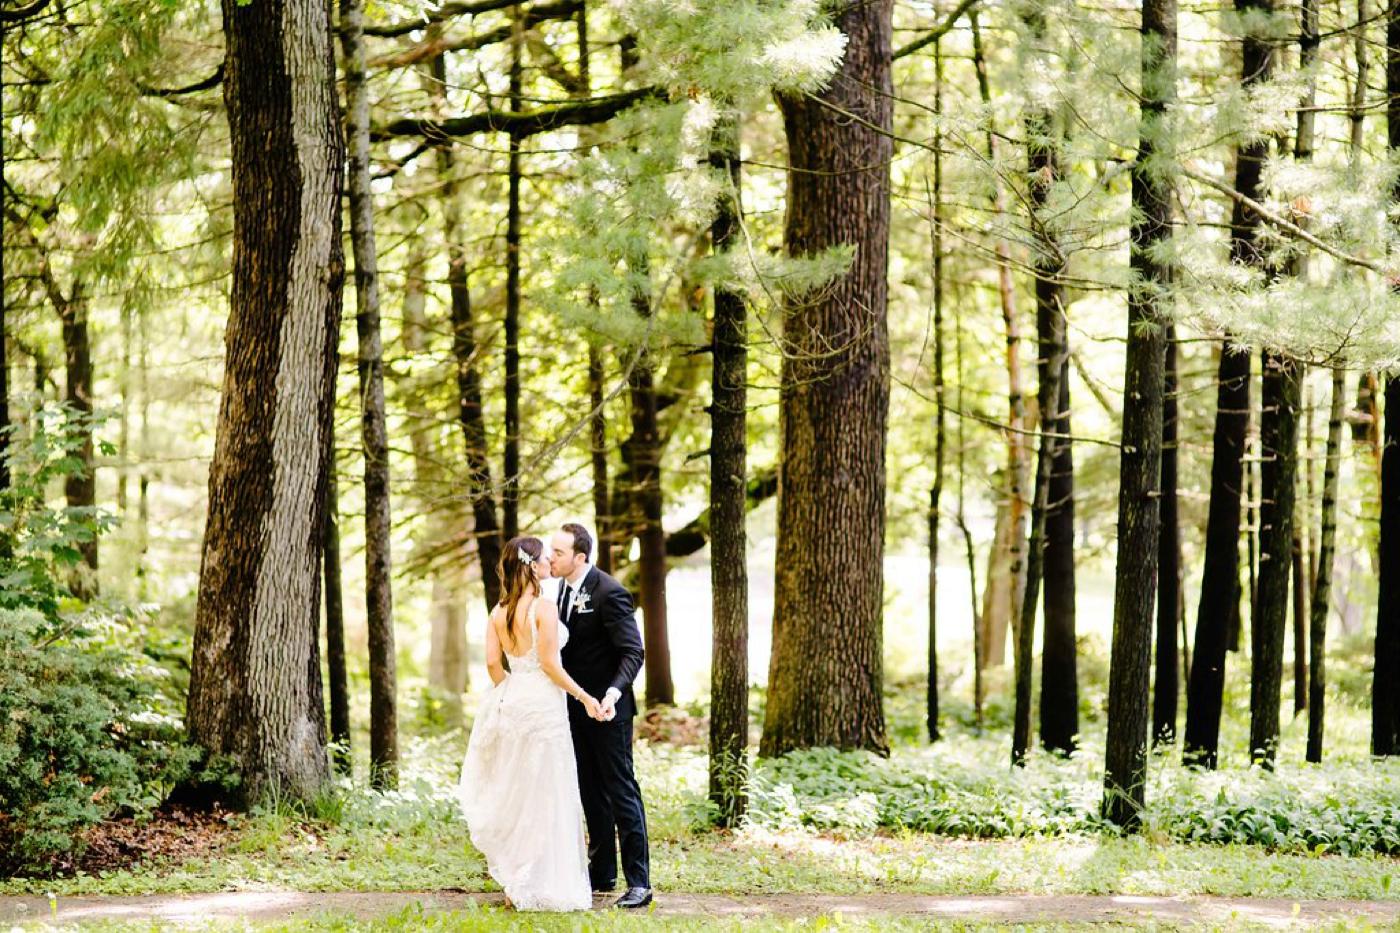 chicago-fine-art-wedding-photography-duncan62